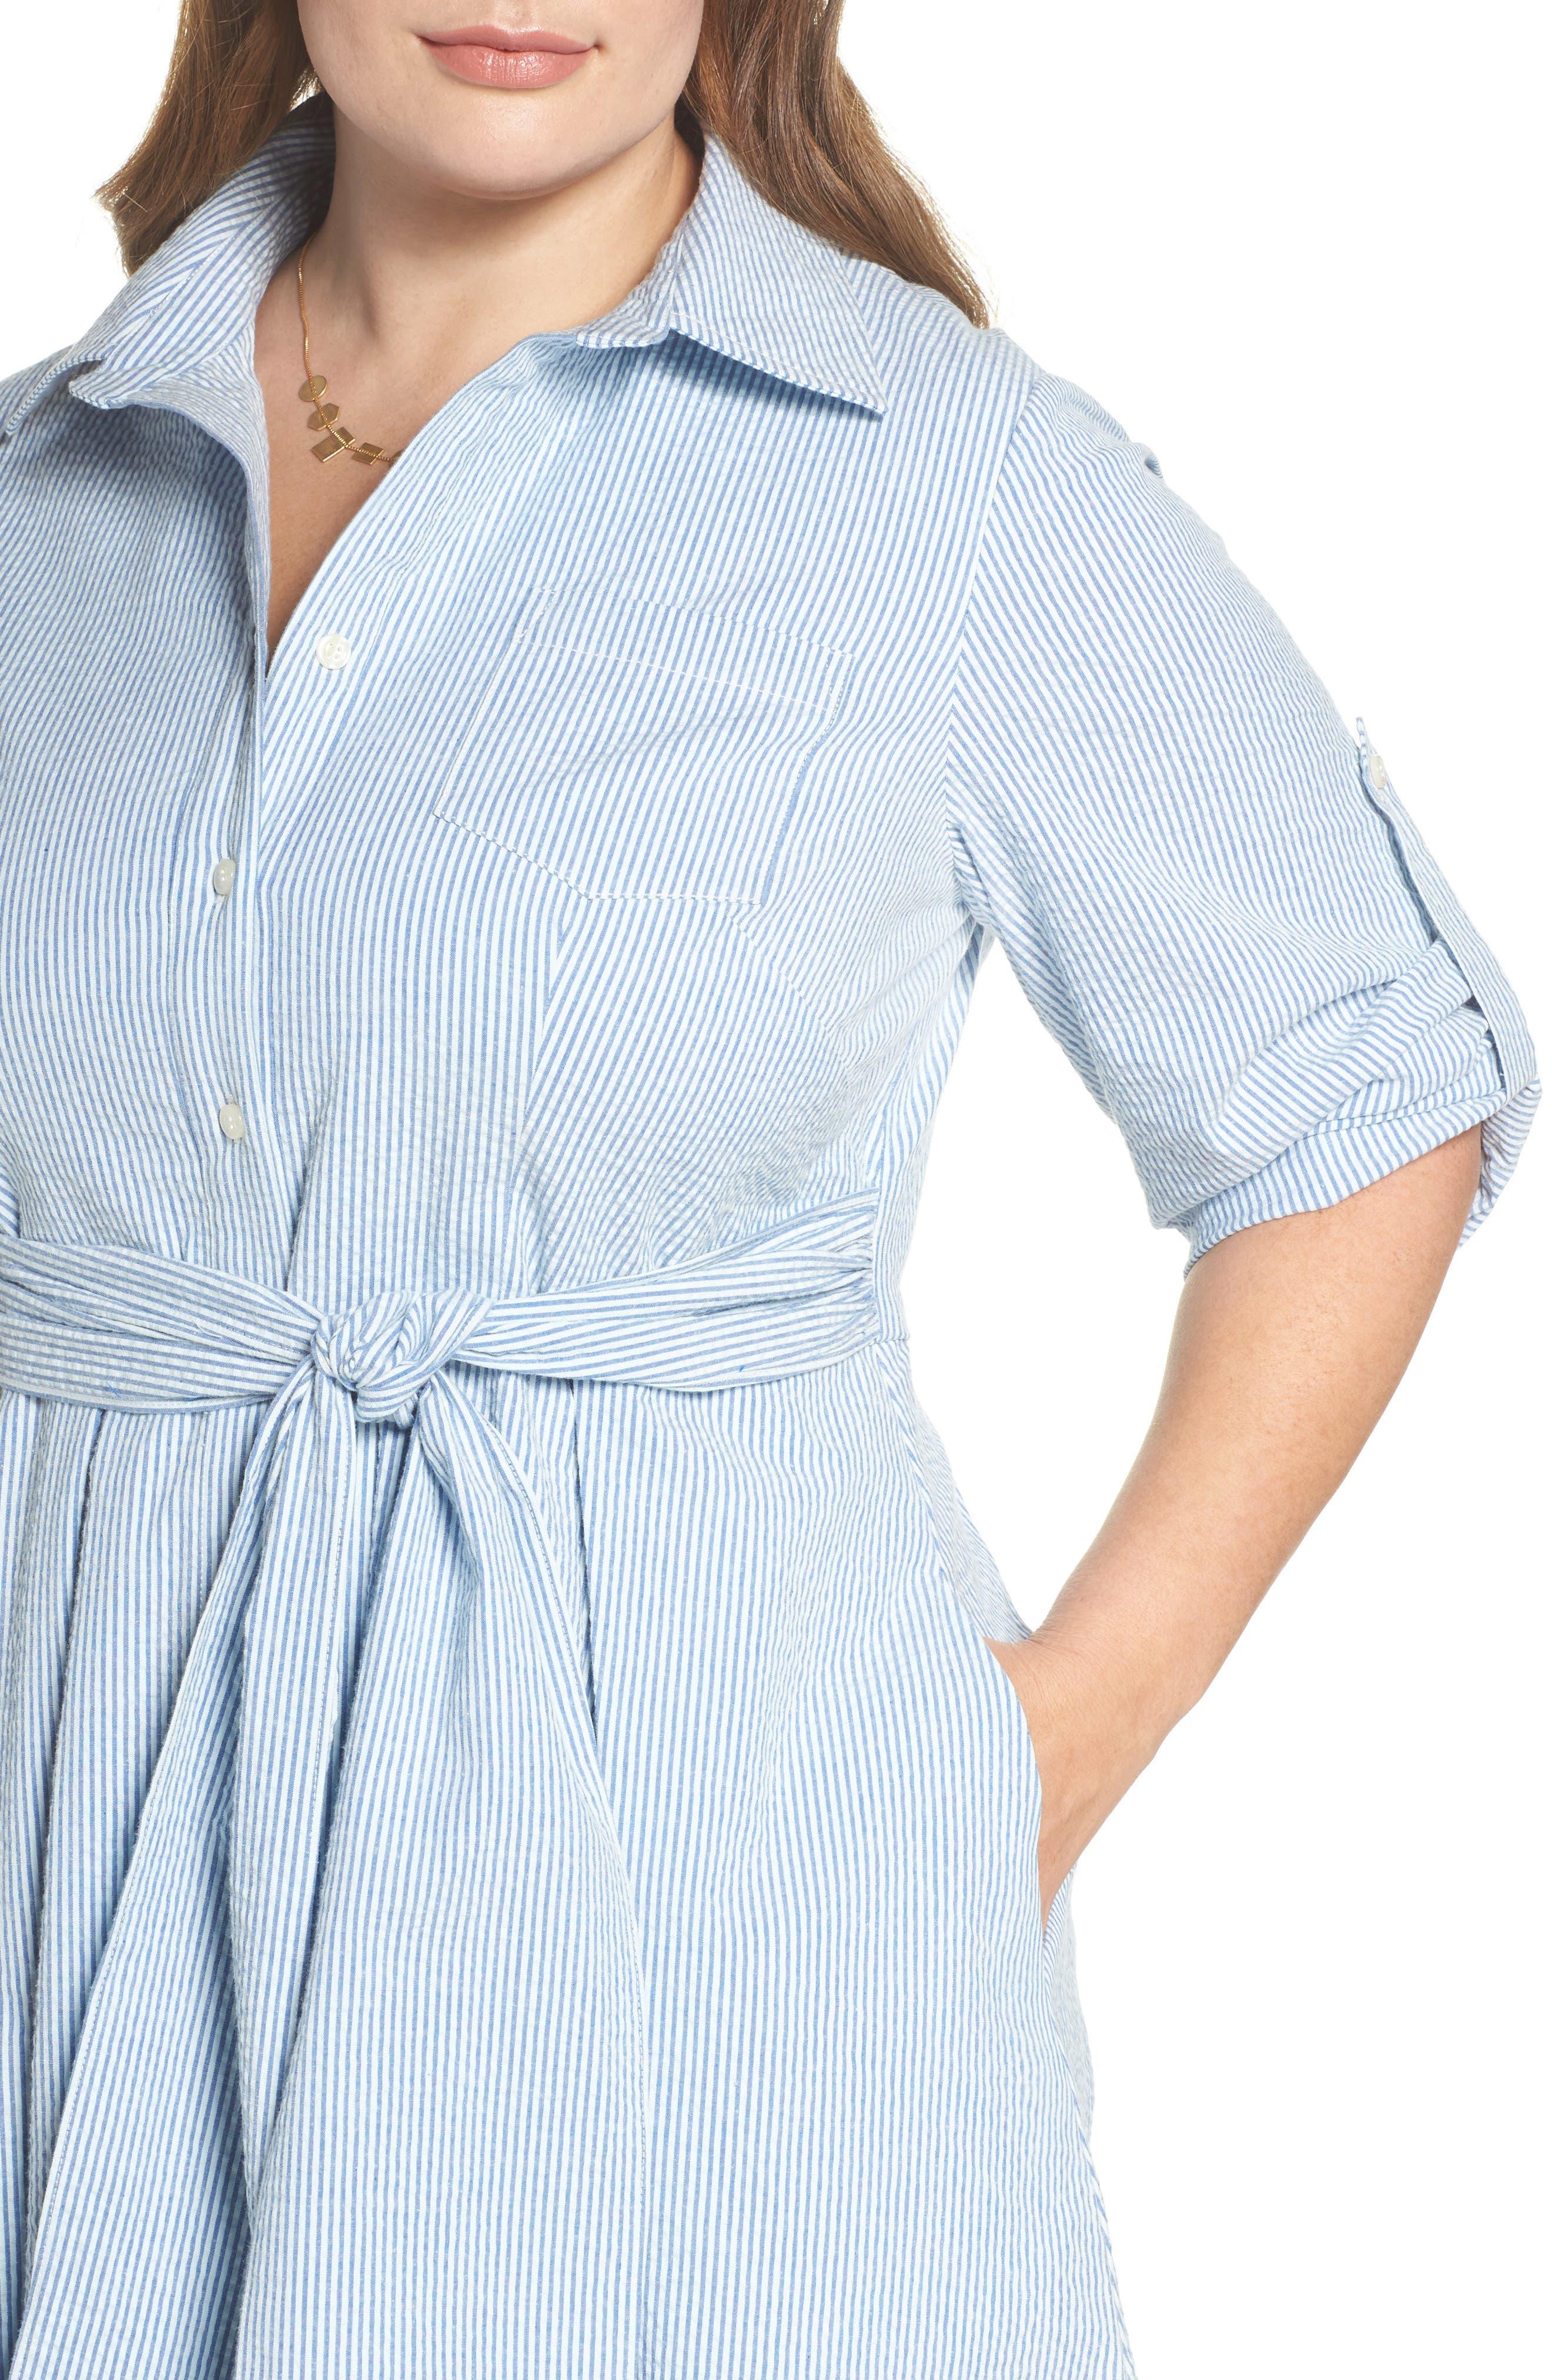 Seersucker Shirtdress,                             Alternate thumbnail 4, color,                             Blue Seersucker